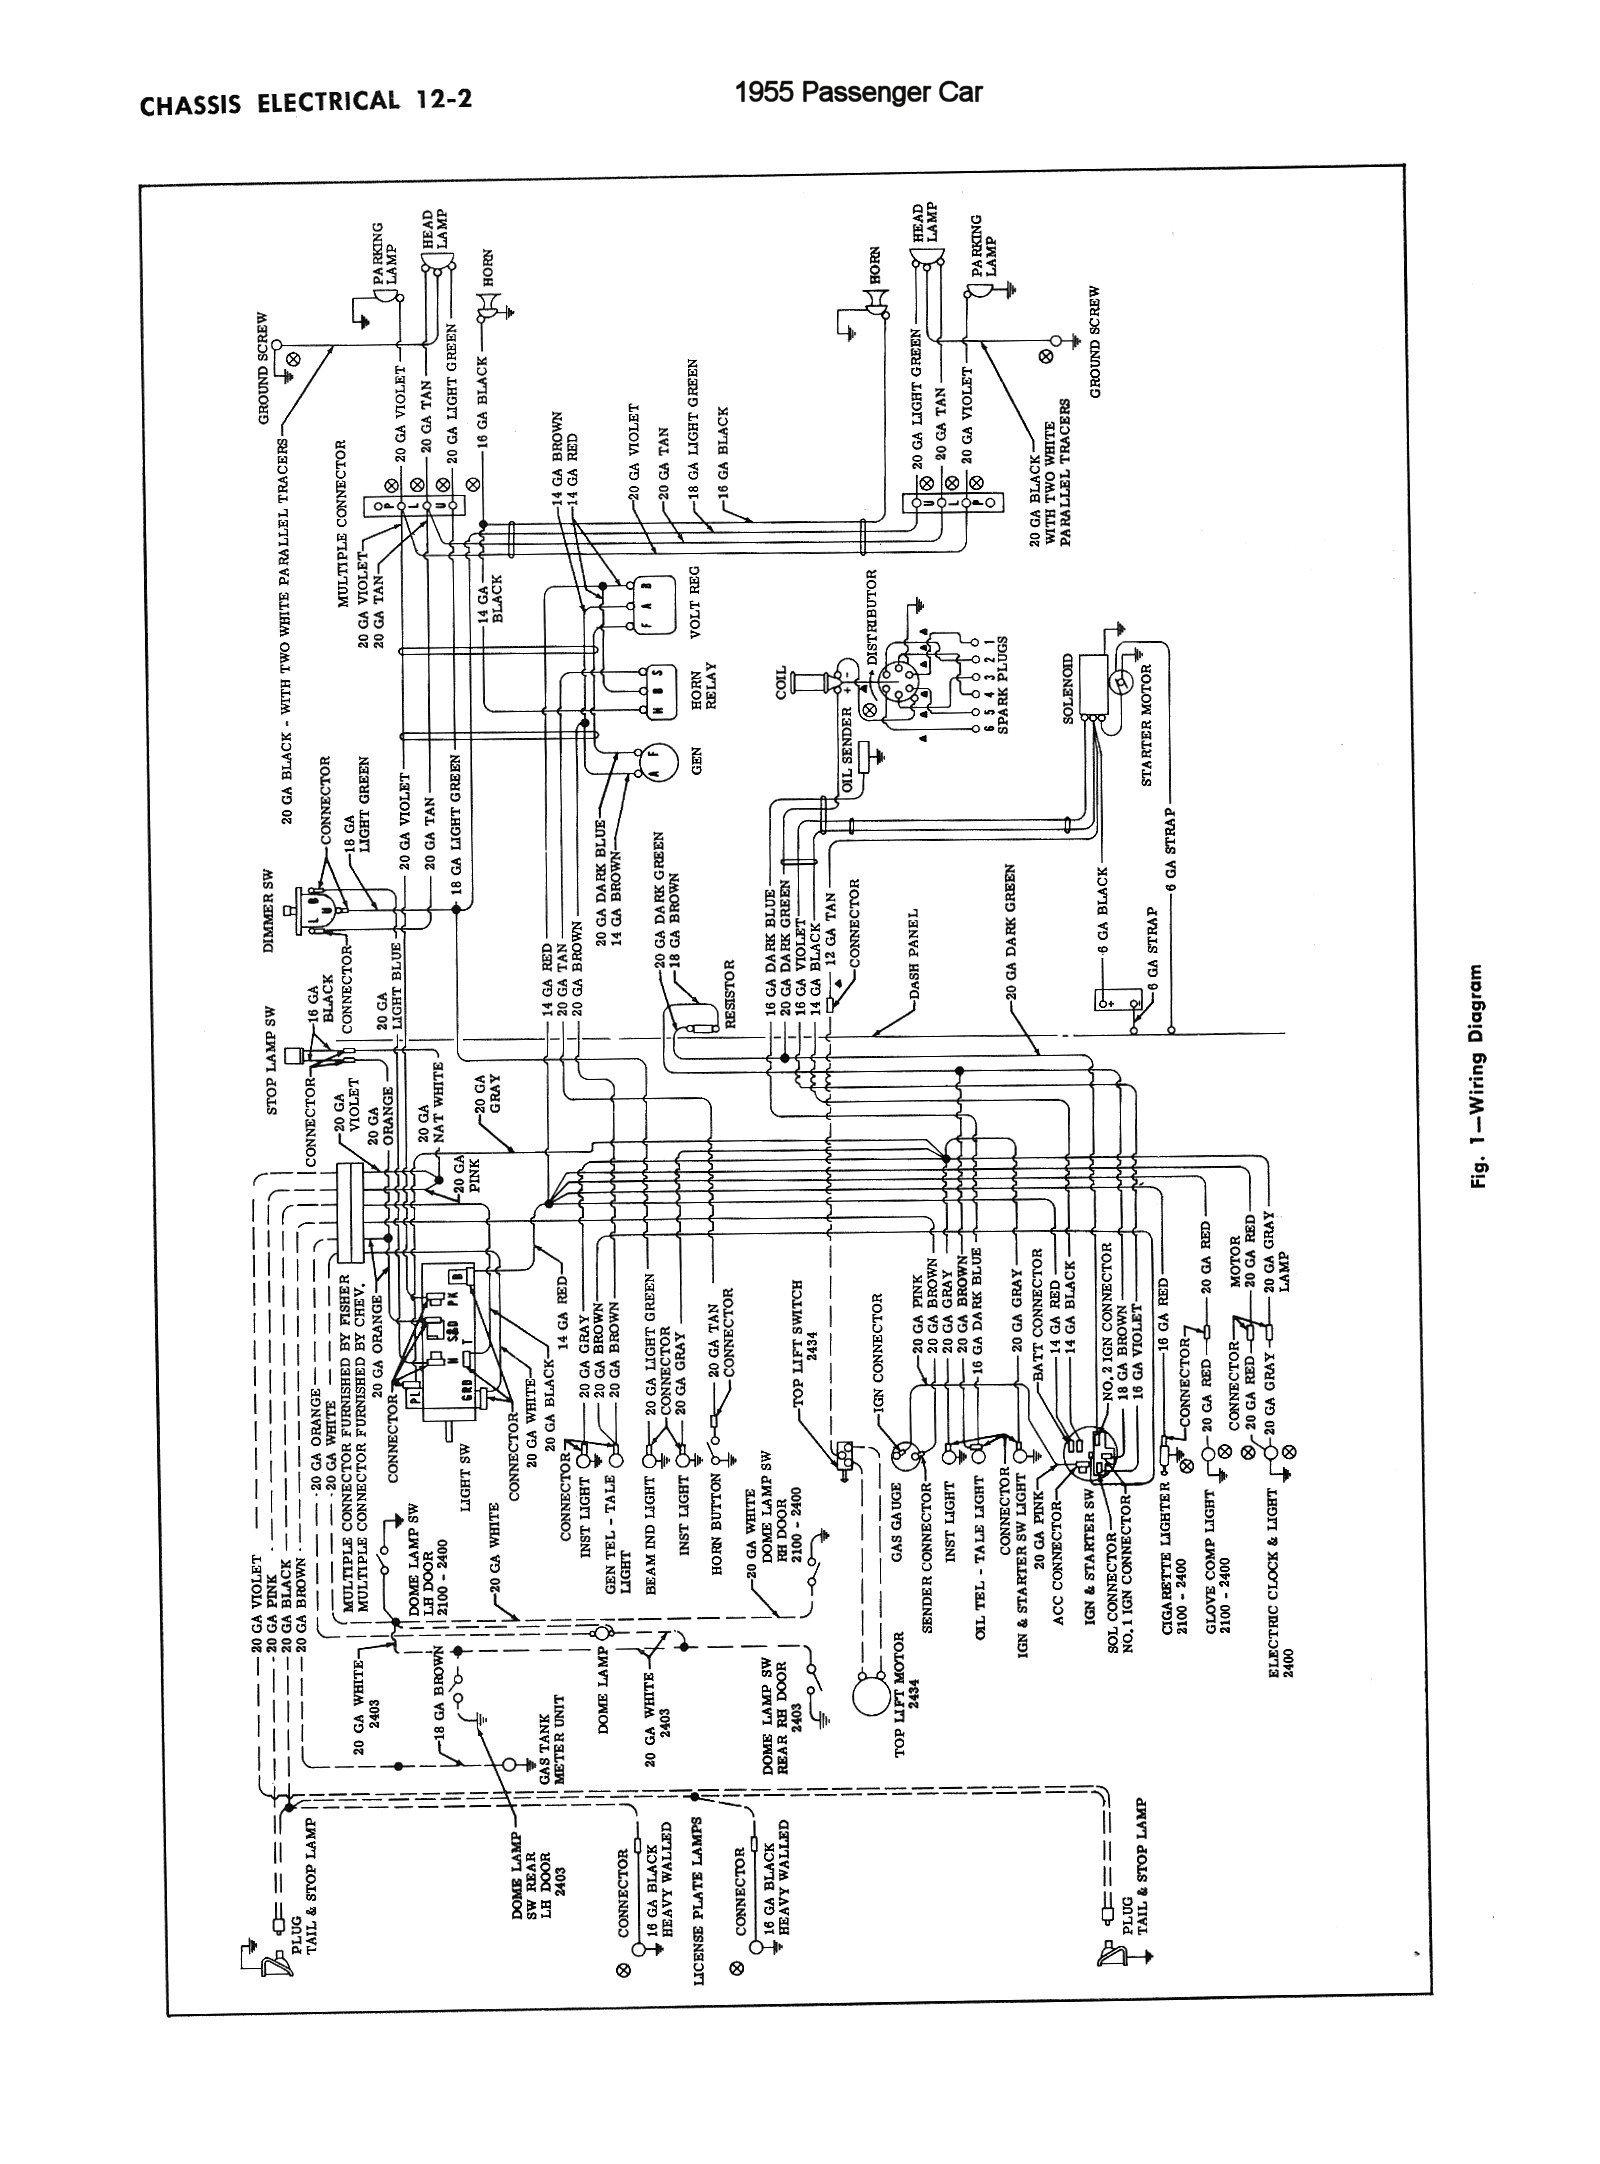 1955 chevy ignition wiring diagram wiring diagram John Deere 4440 Electrical Diagram john deere lx176 wiring diagram